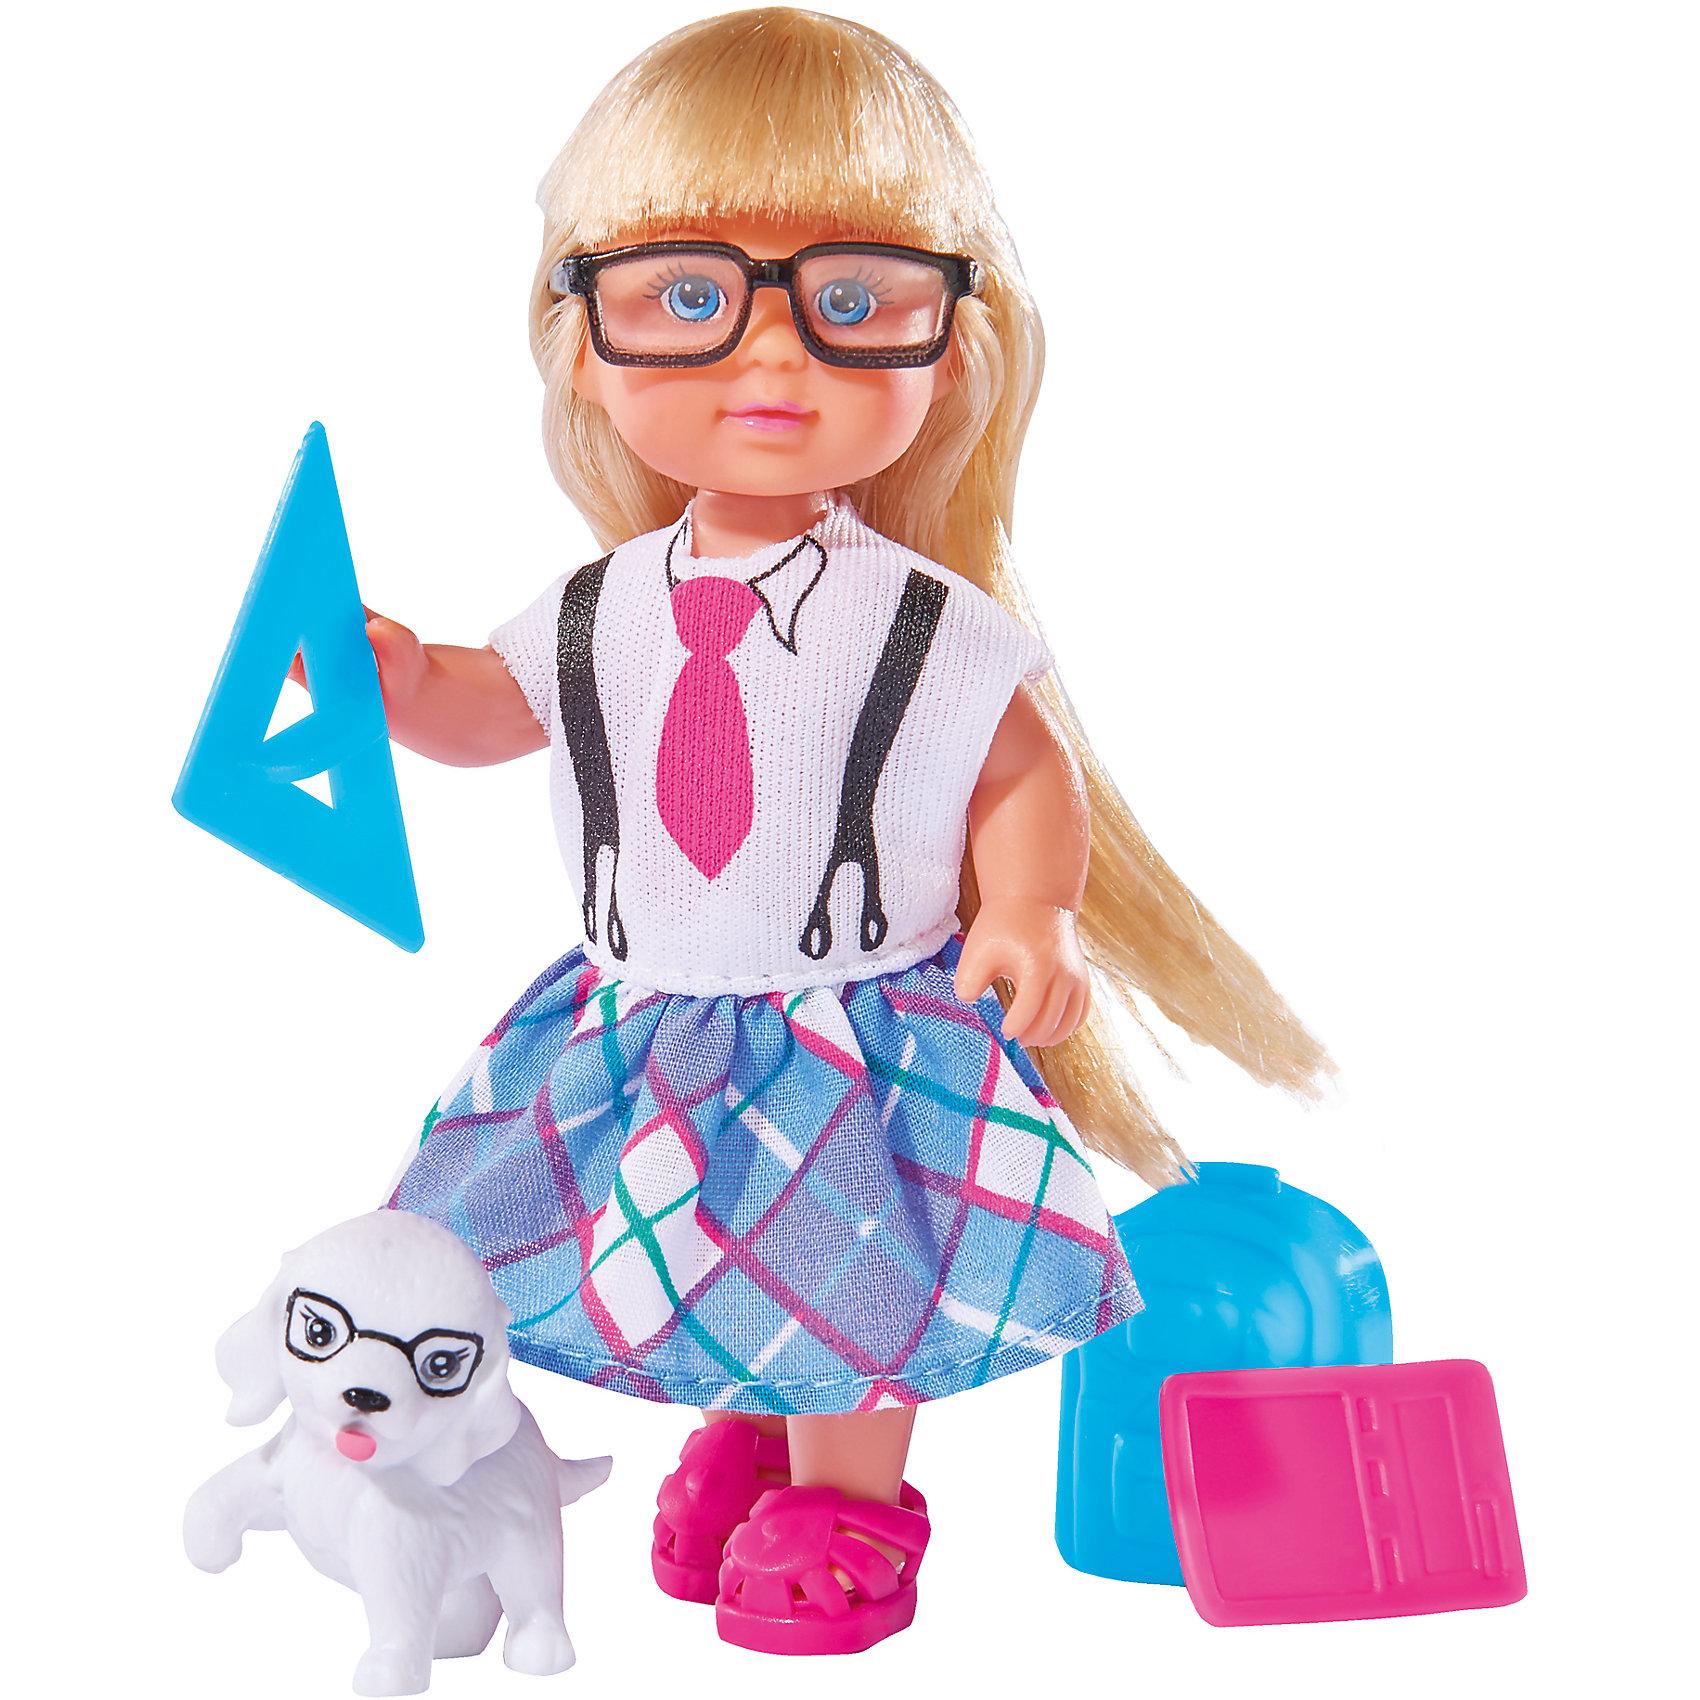 simba кукла еви с подружкой Simba Кукла Еви и школьные принадлежности, Simba